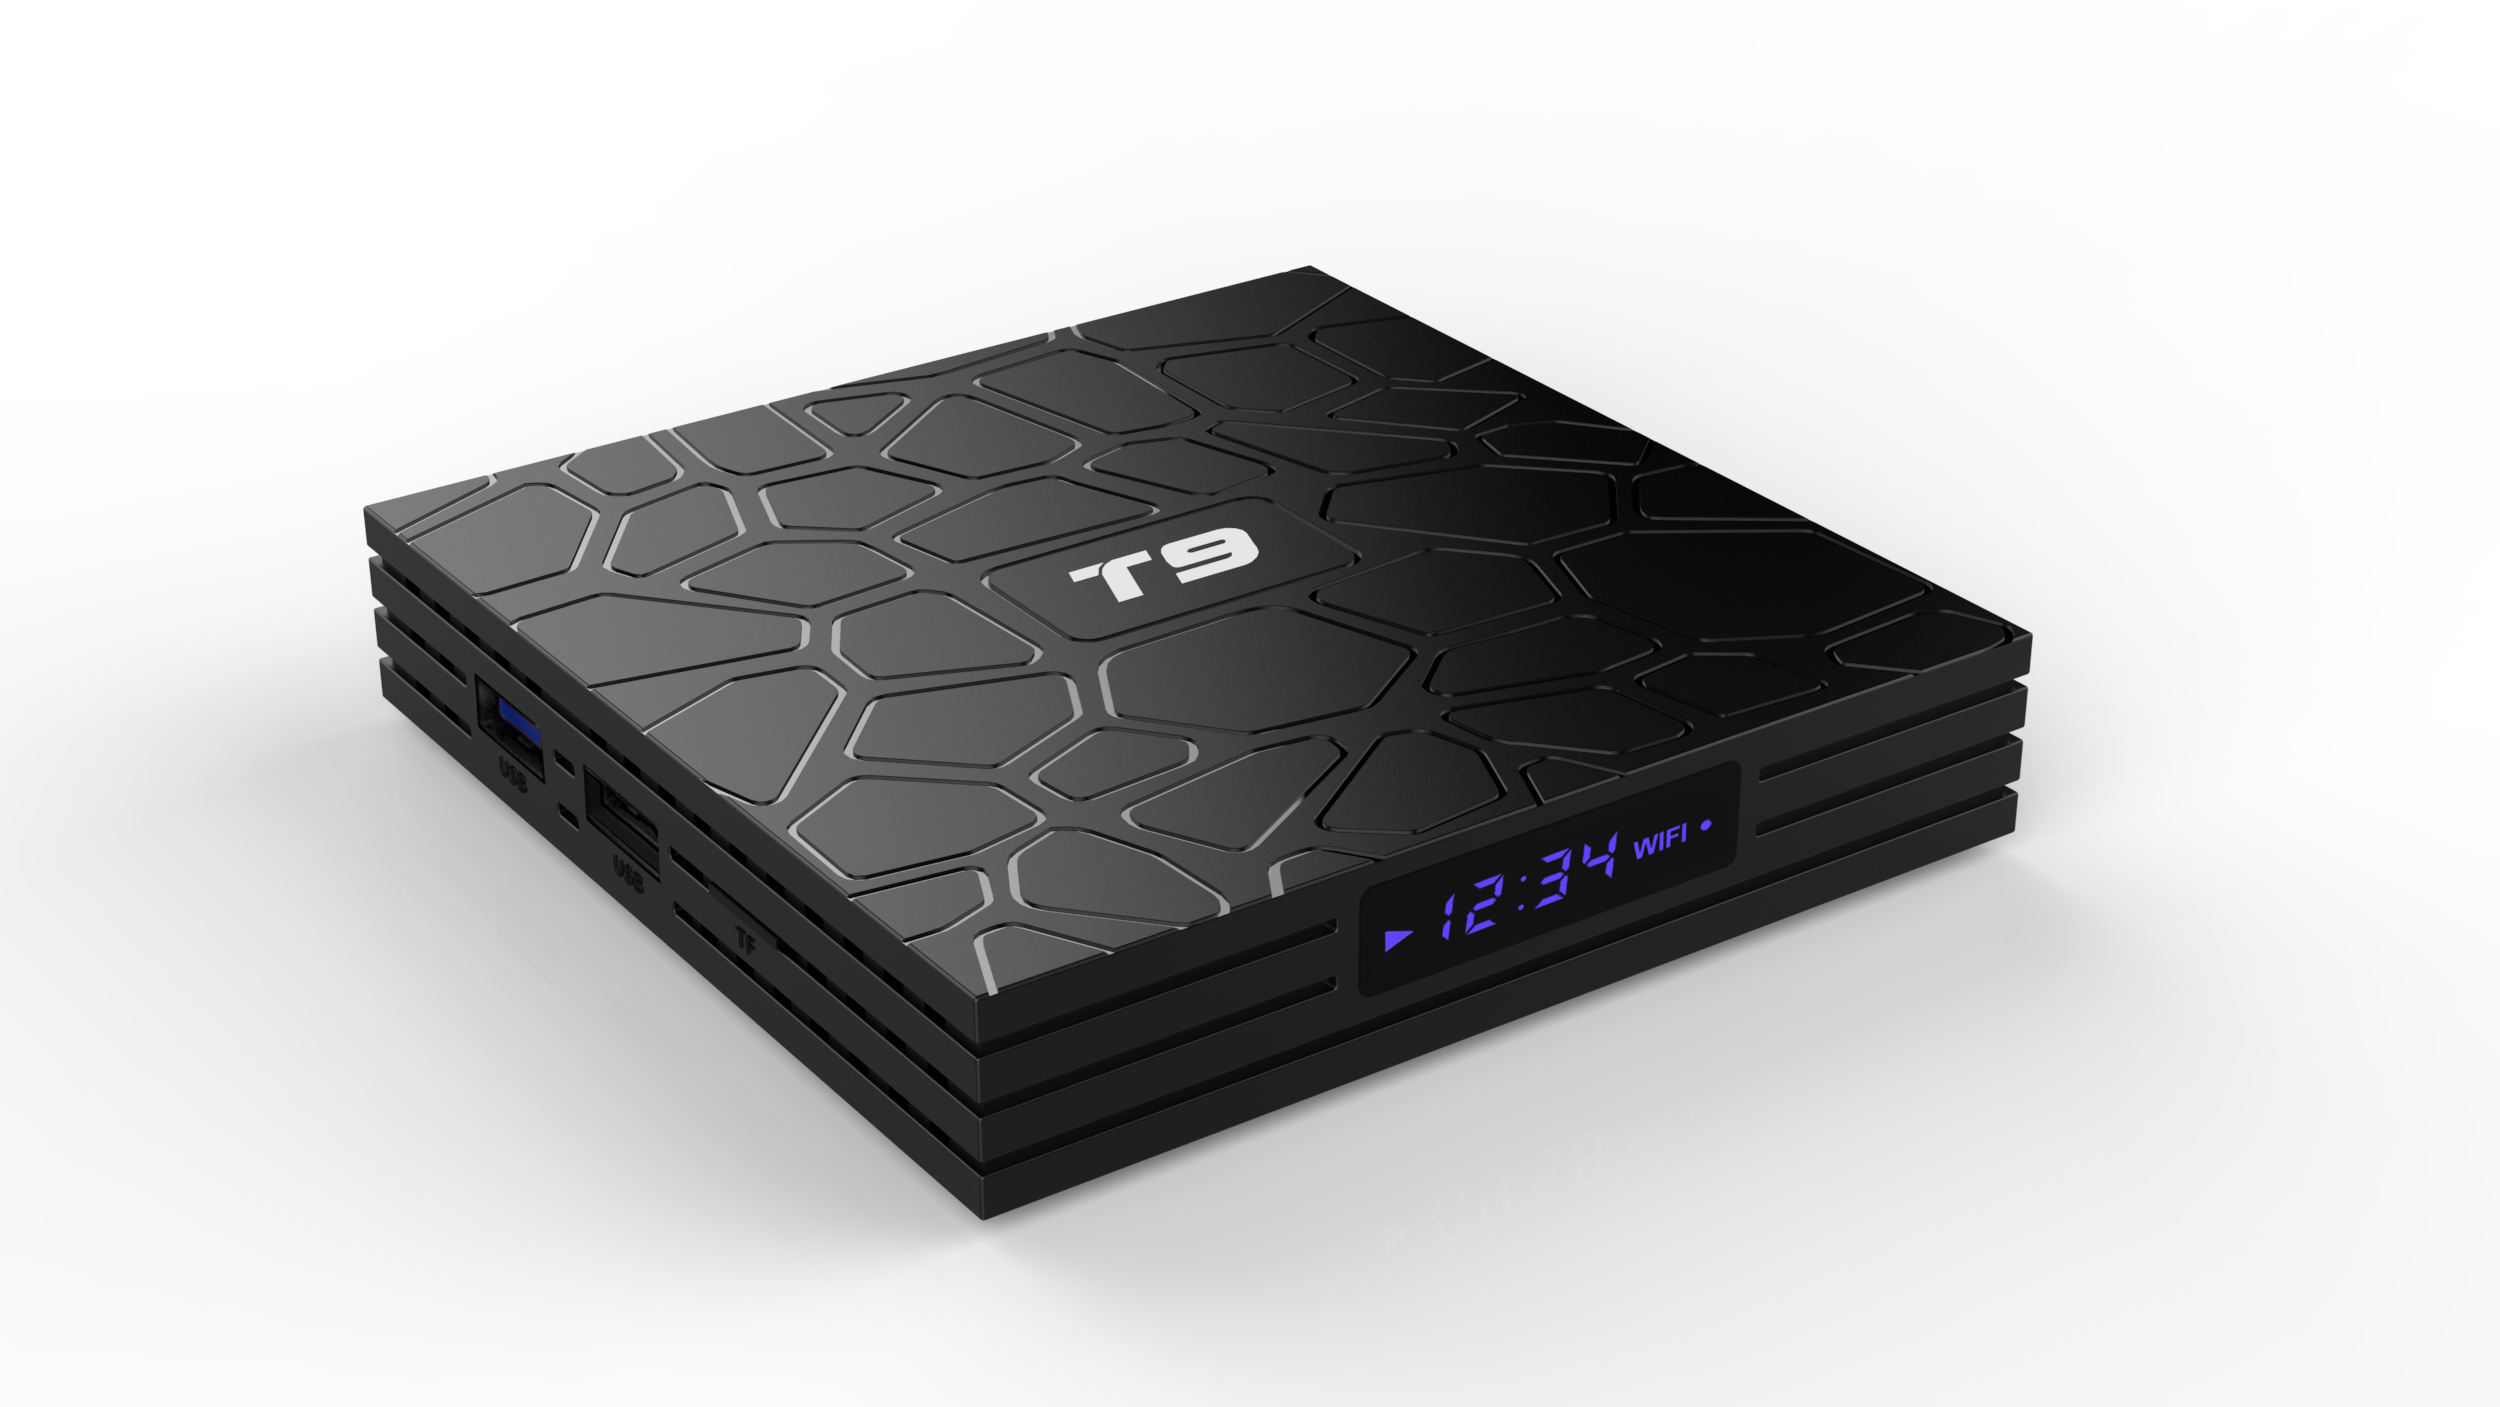 tv box android 8.1 4gb 64 gb octa  China New Arrival Product T9 Smart Set Top Box Pk 3328 Octa-Core ...